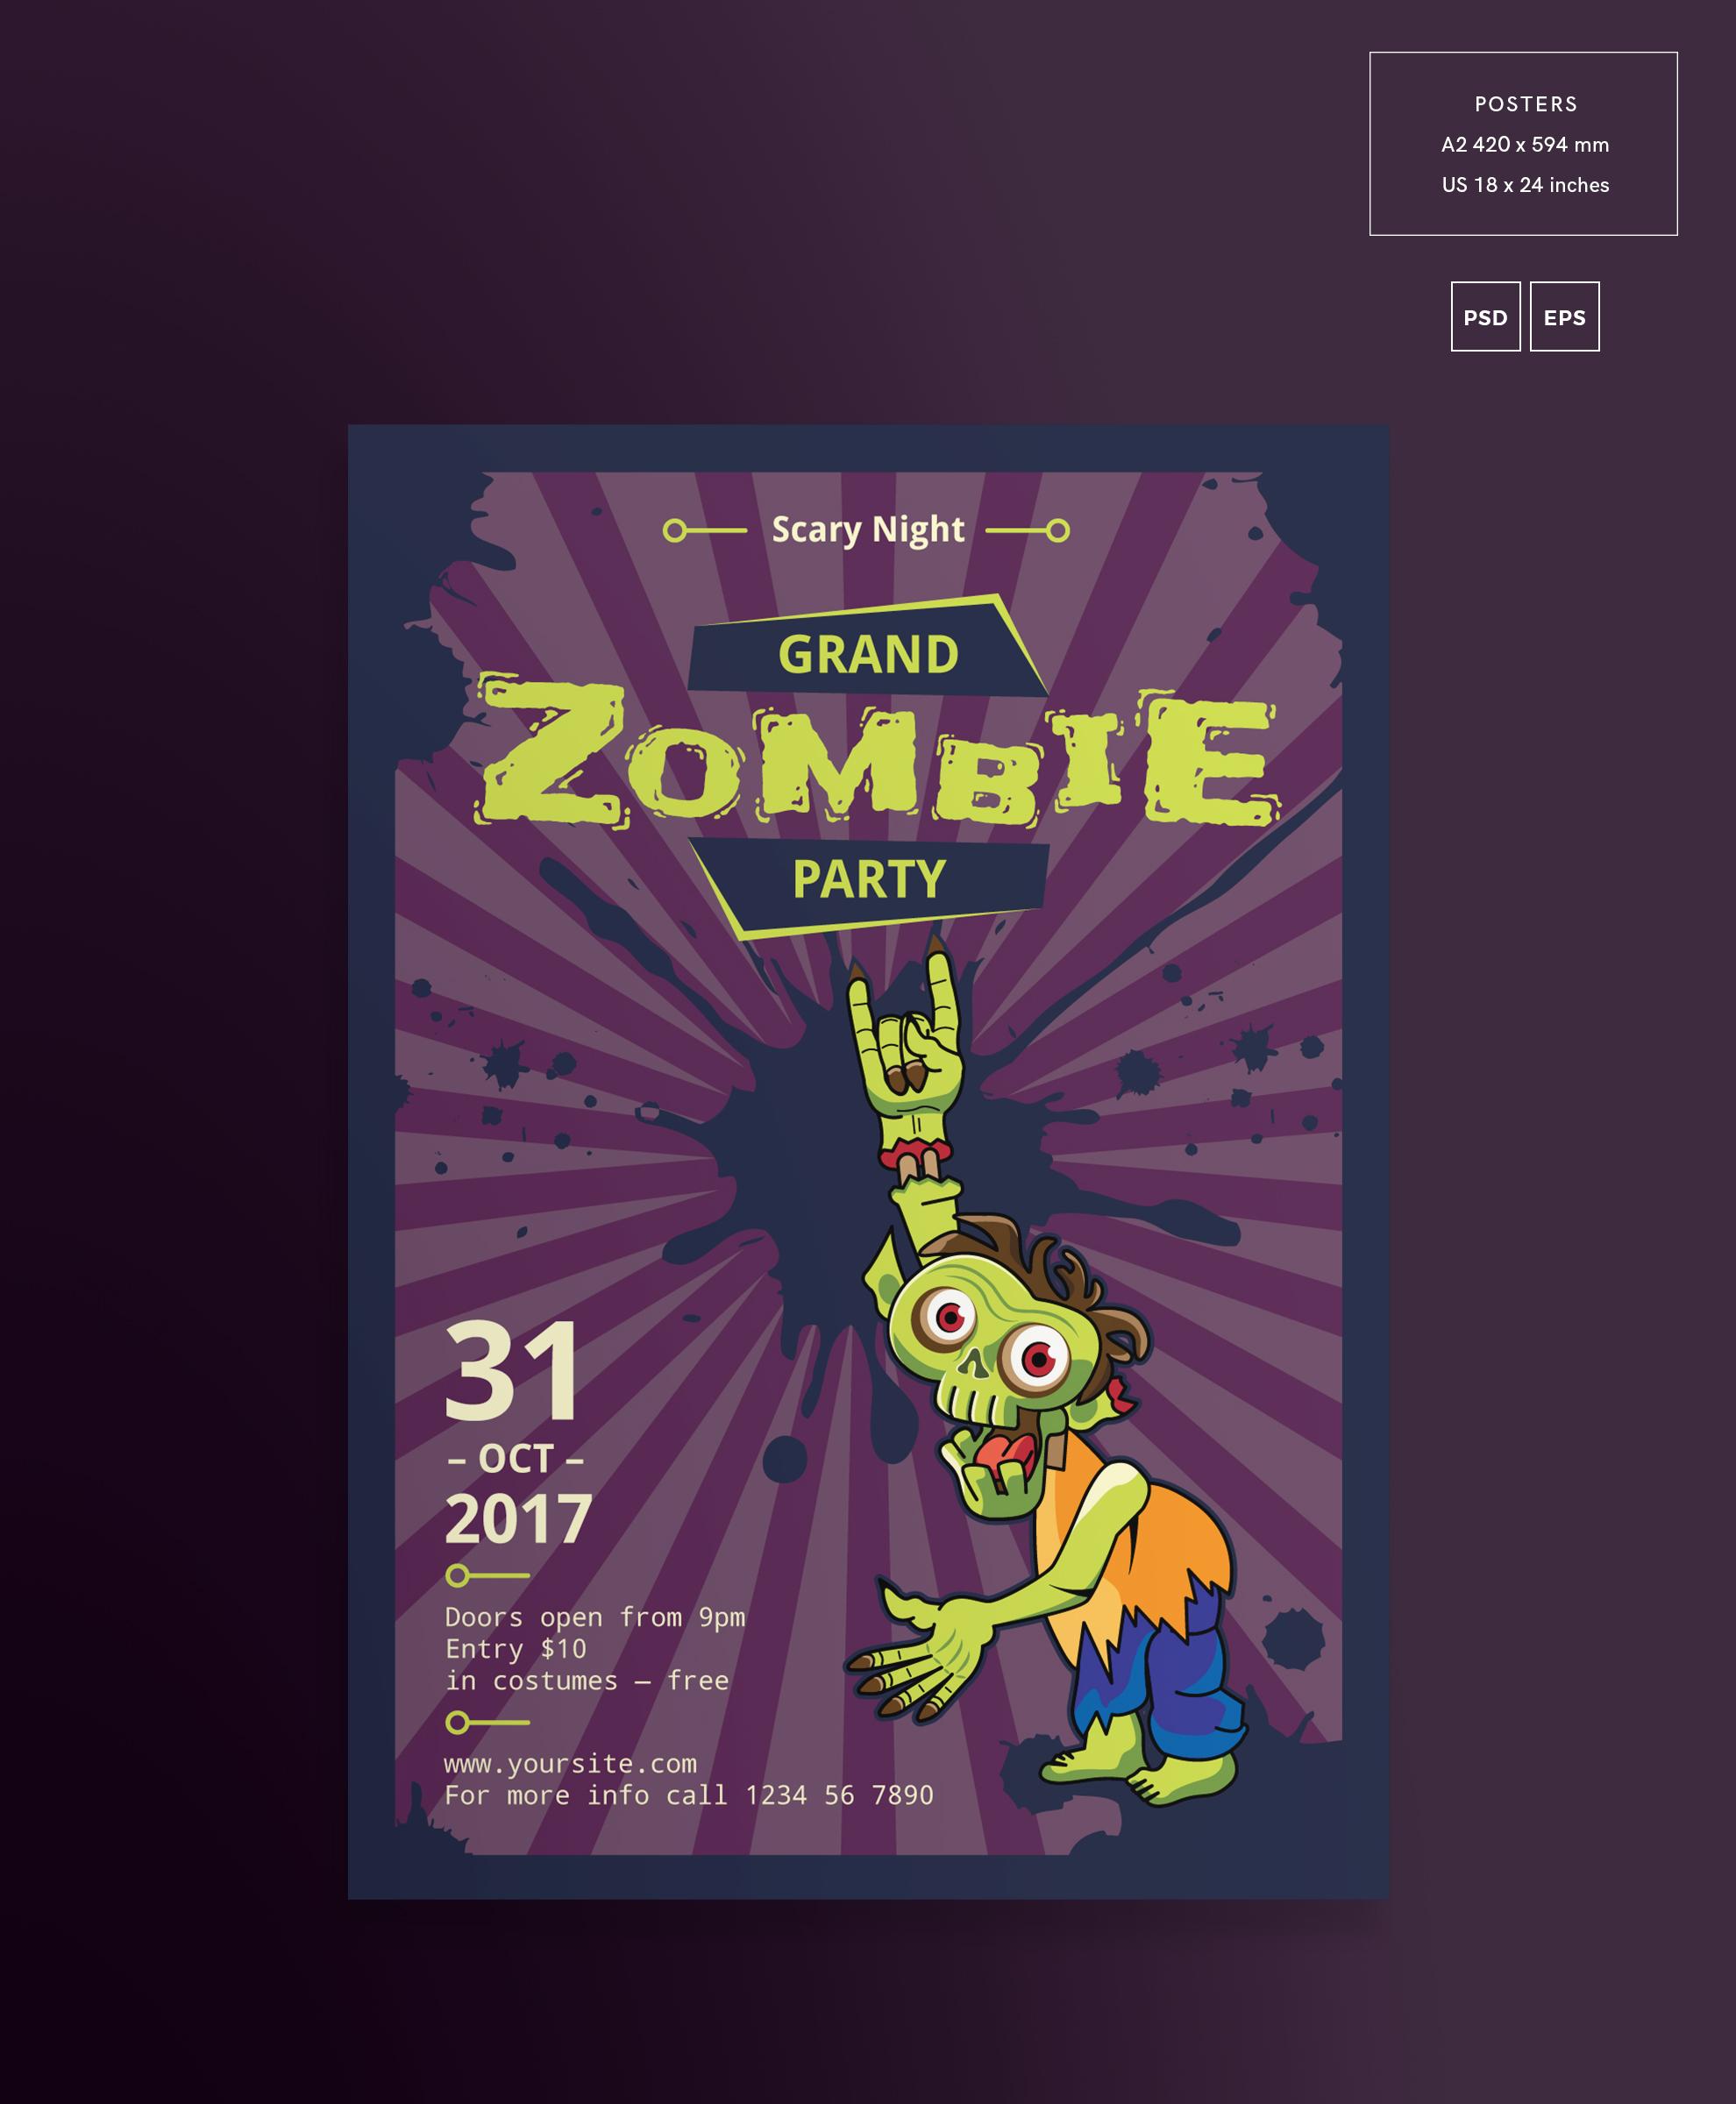 Zombie Party Design Templates Bundle example image 3